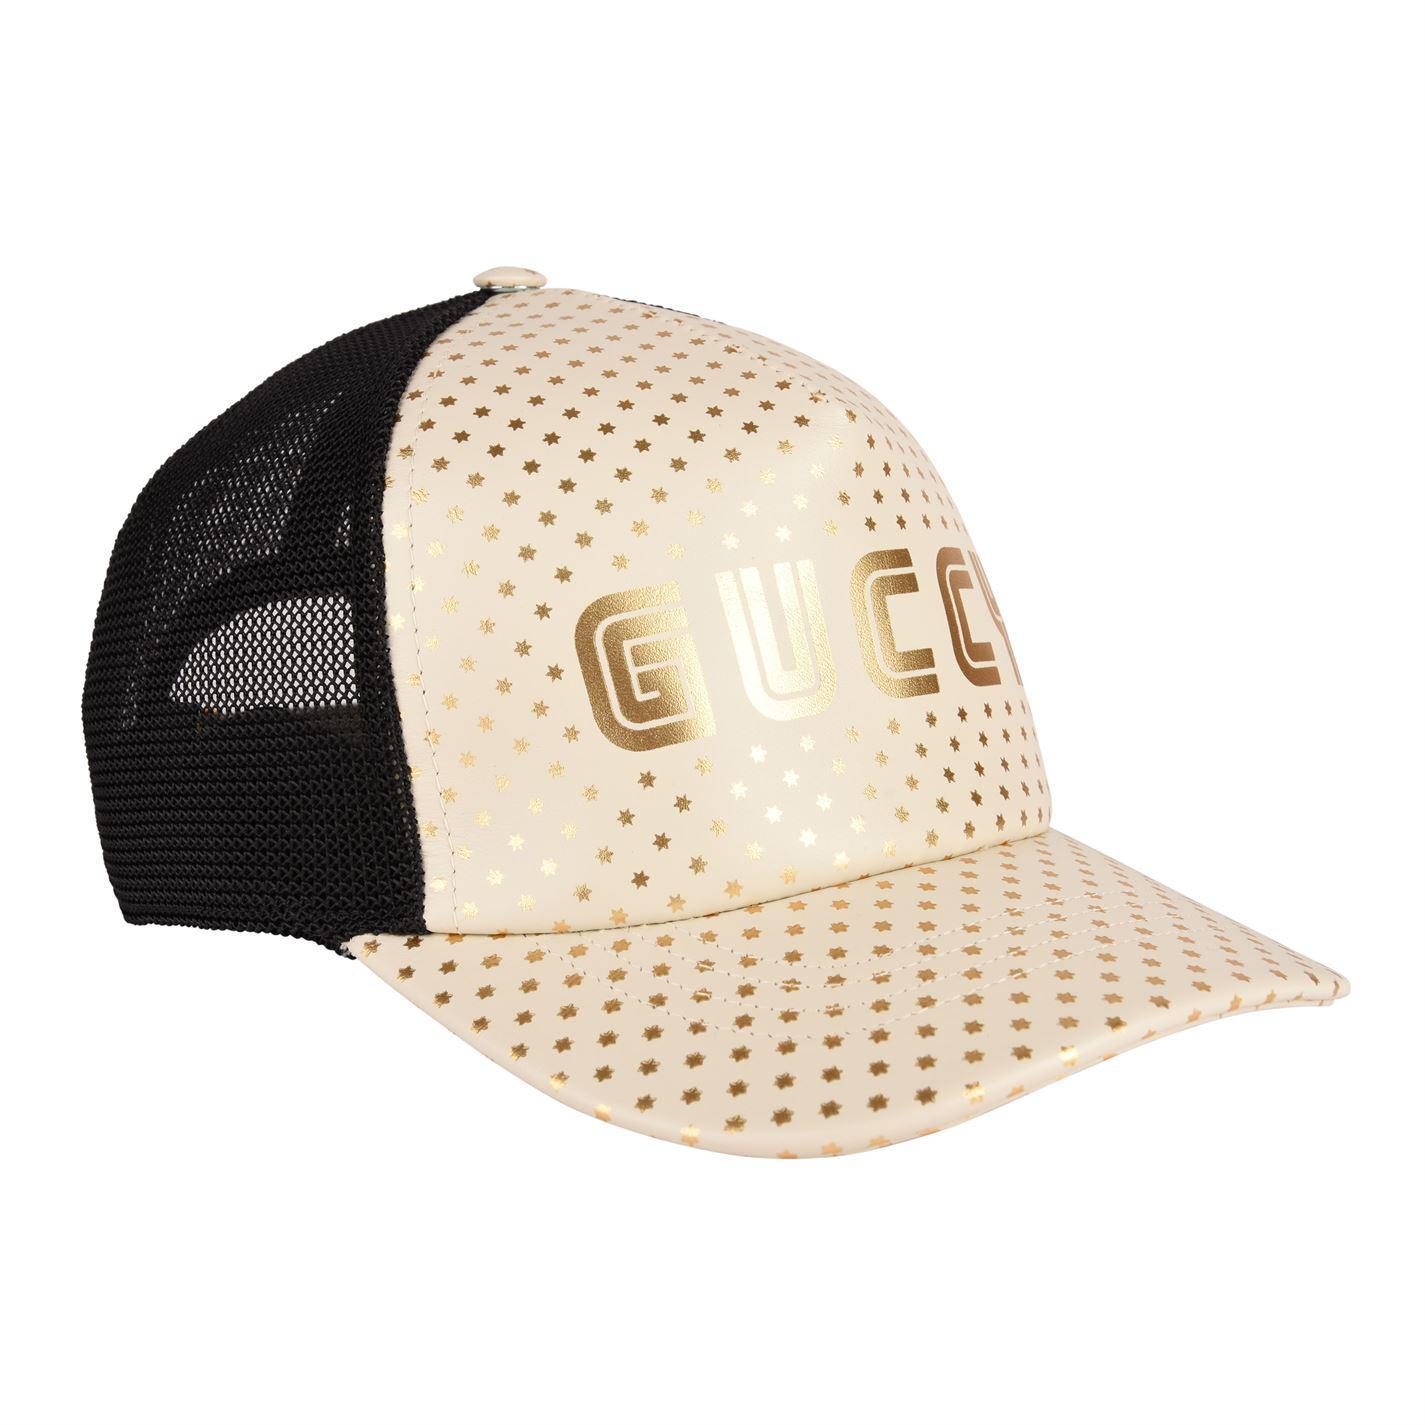 63f057a9f90 Gucci - White Guccy Cap for Men - Lyst. View fullscreen